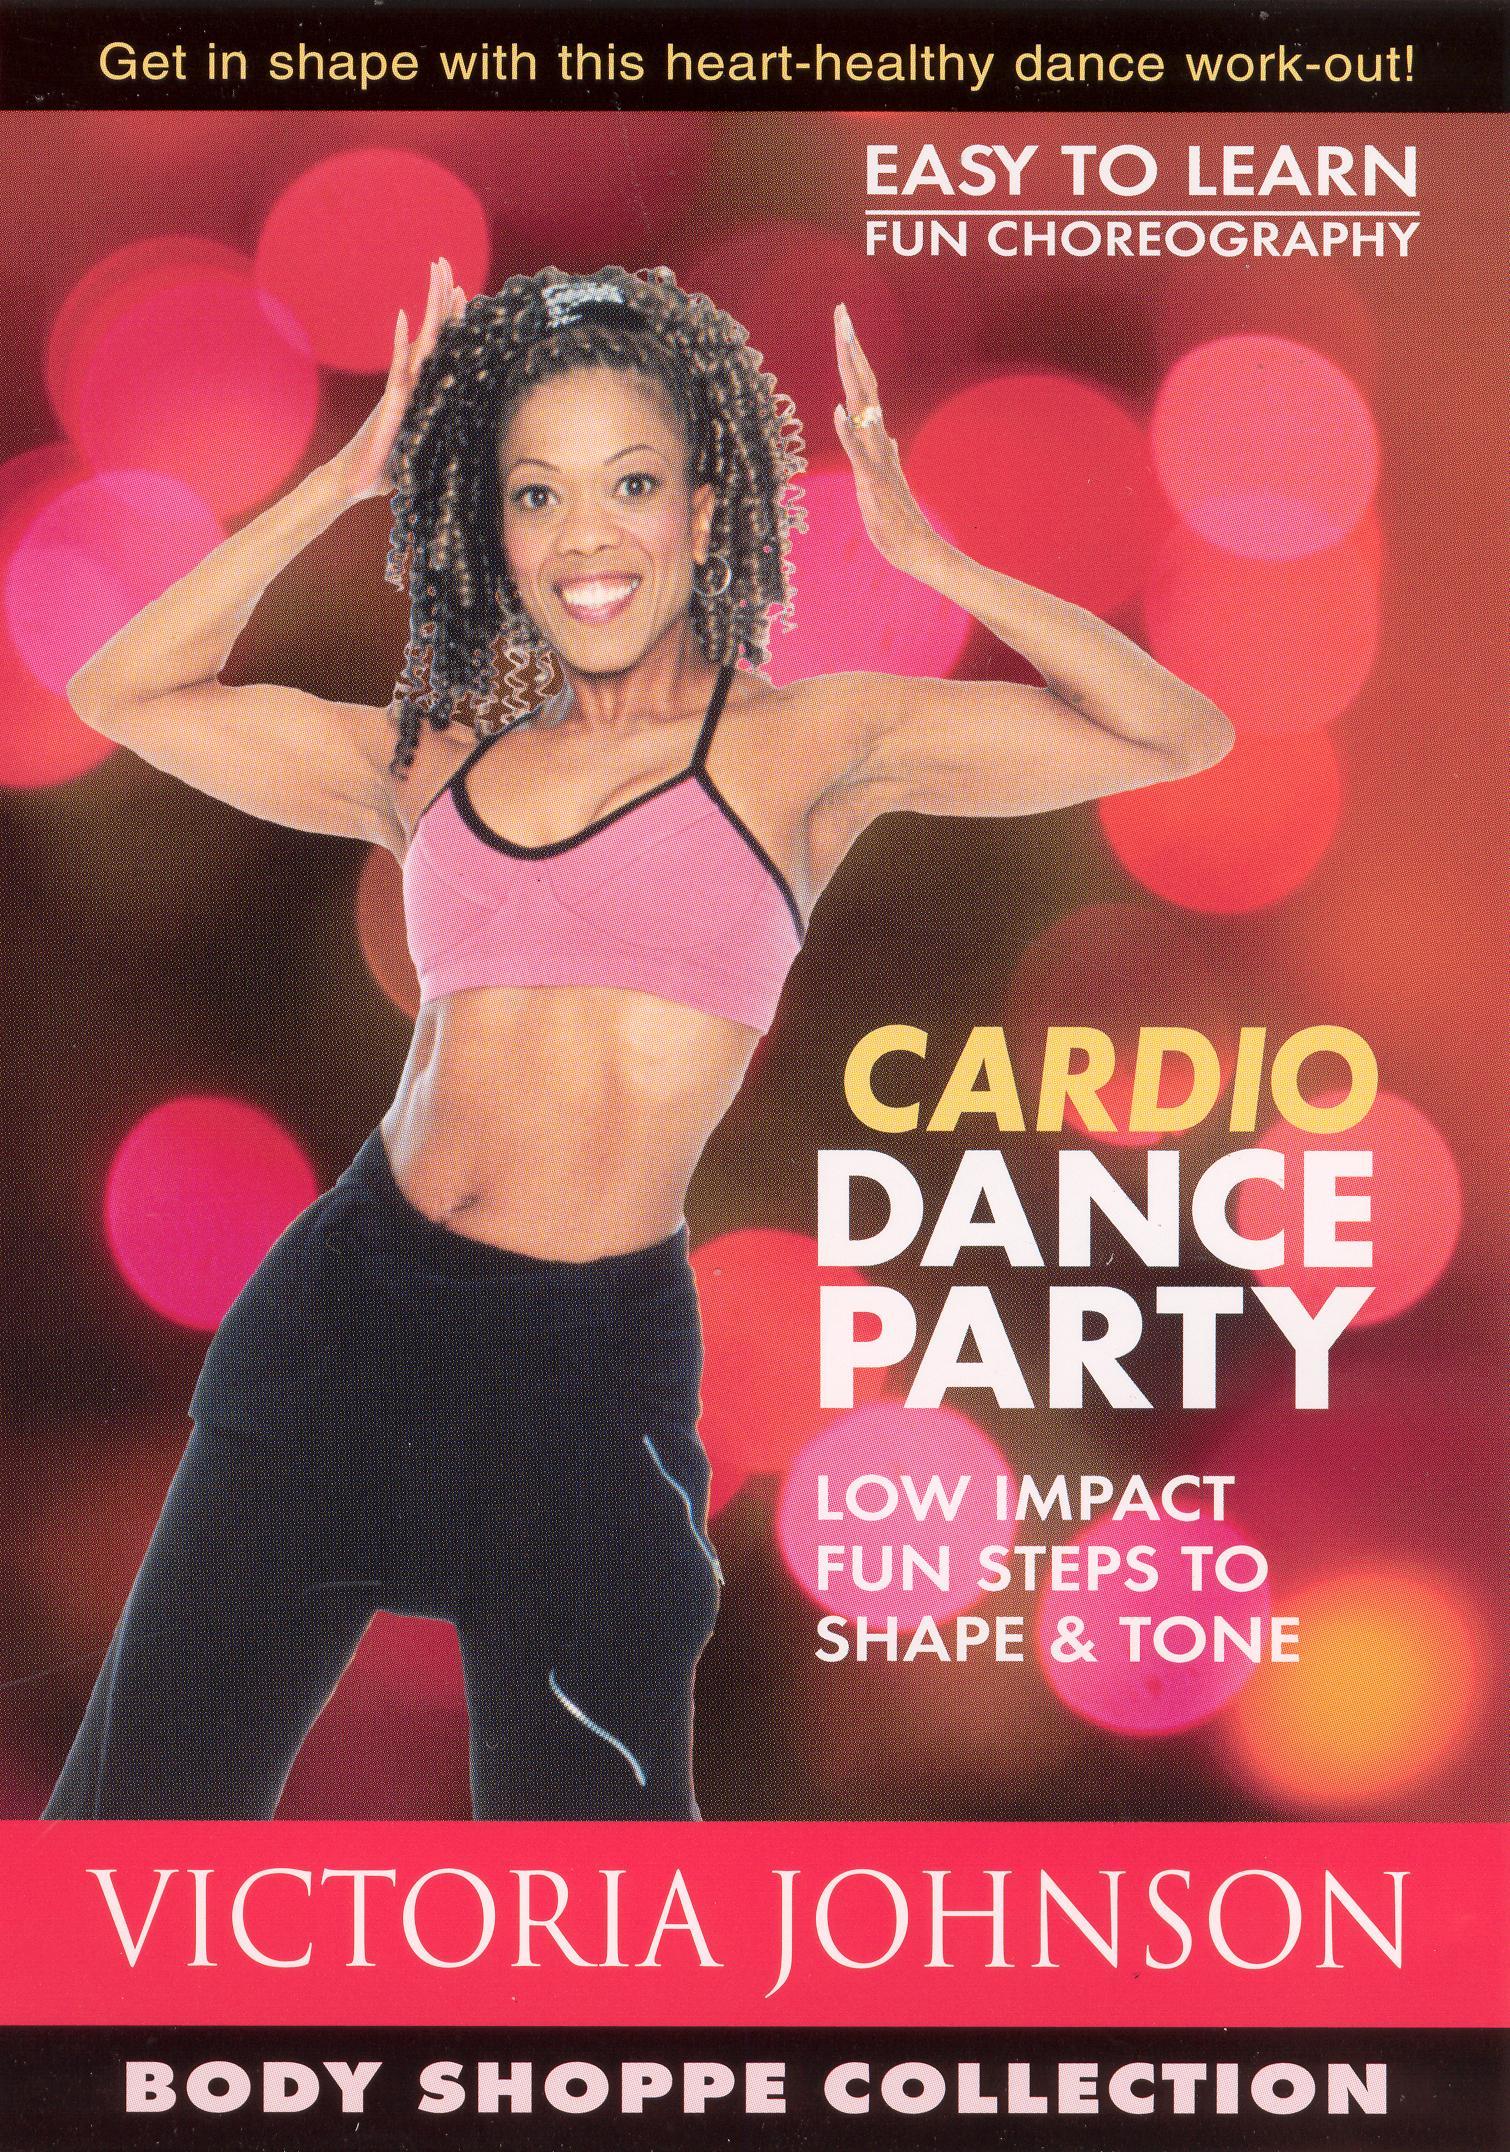 Victoria Johnson: Cardio Dance Party